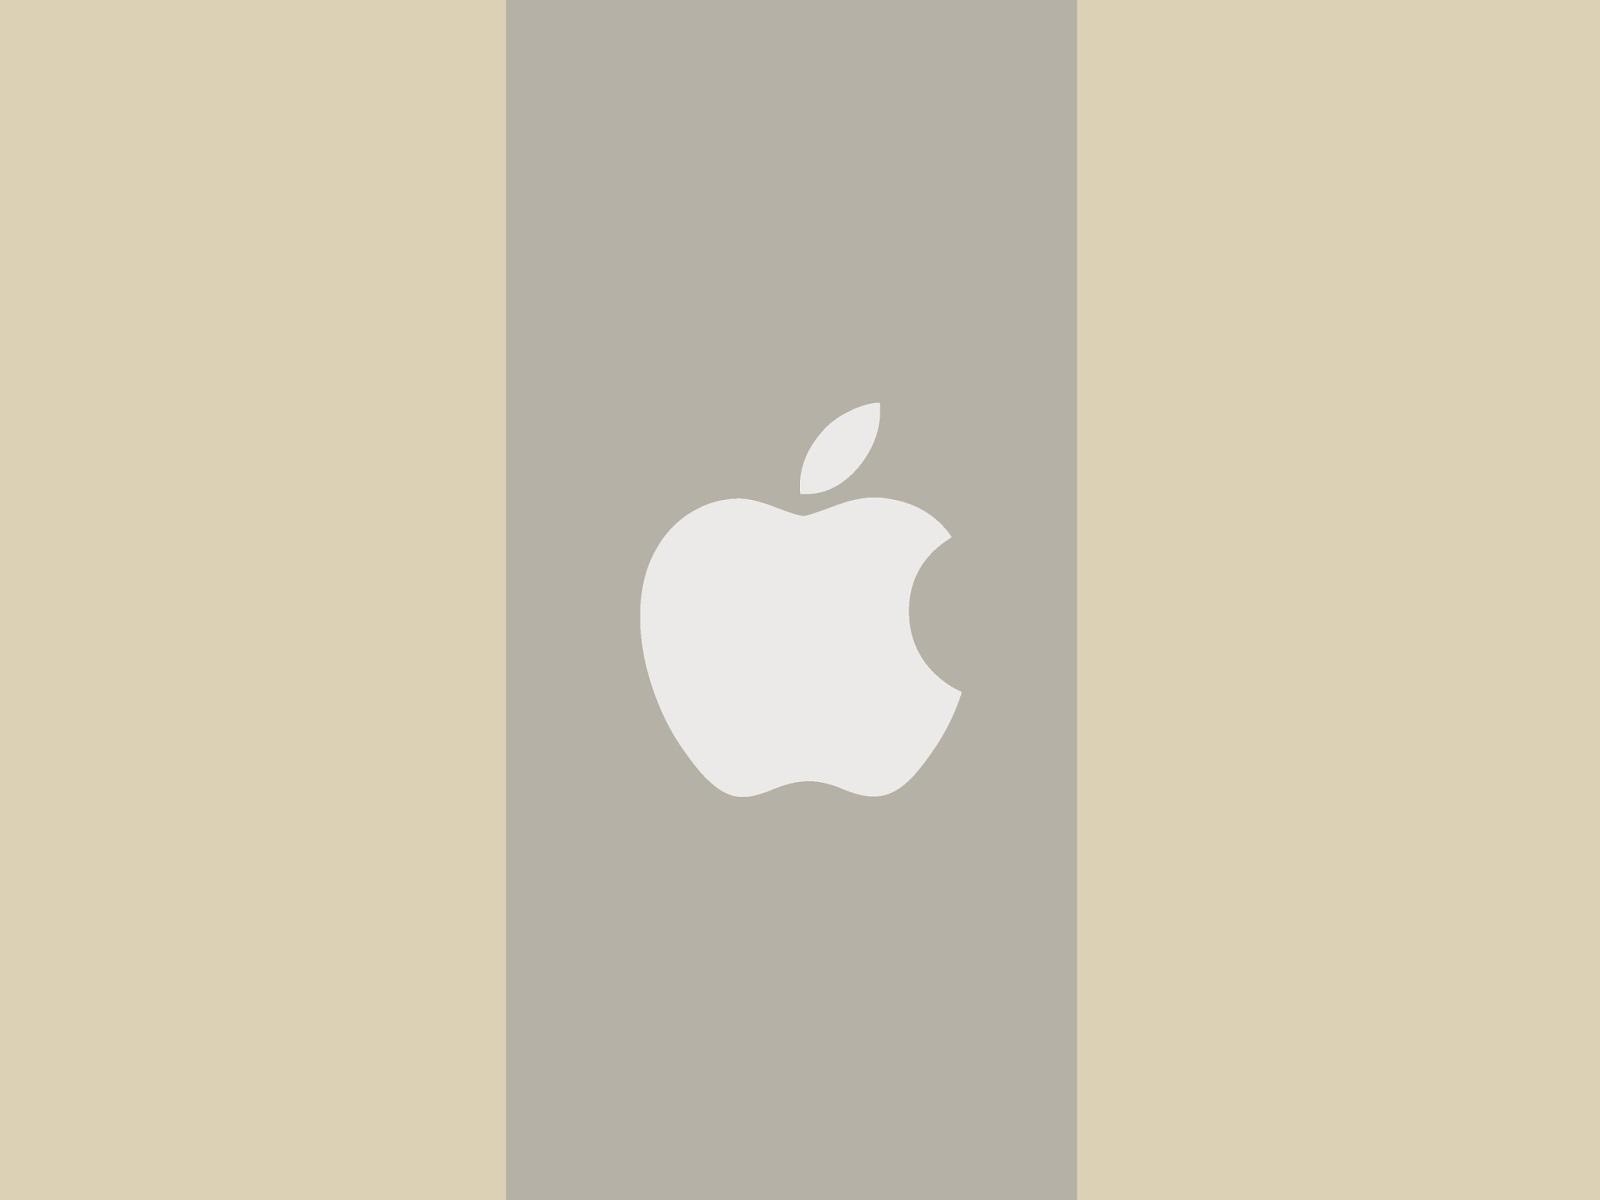 Light Pure Cappuccino X Colors Apple IMac And MacBook Pro Wallpaper HD High Quality 4000x3000 Pixels 43